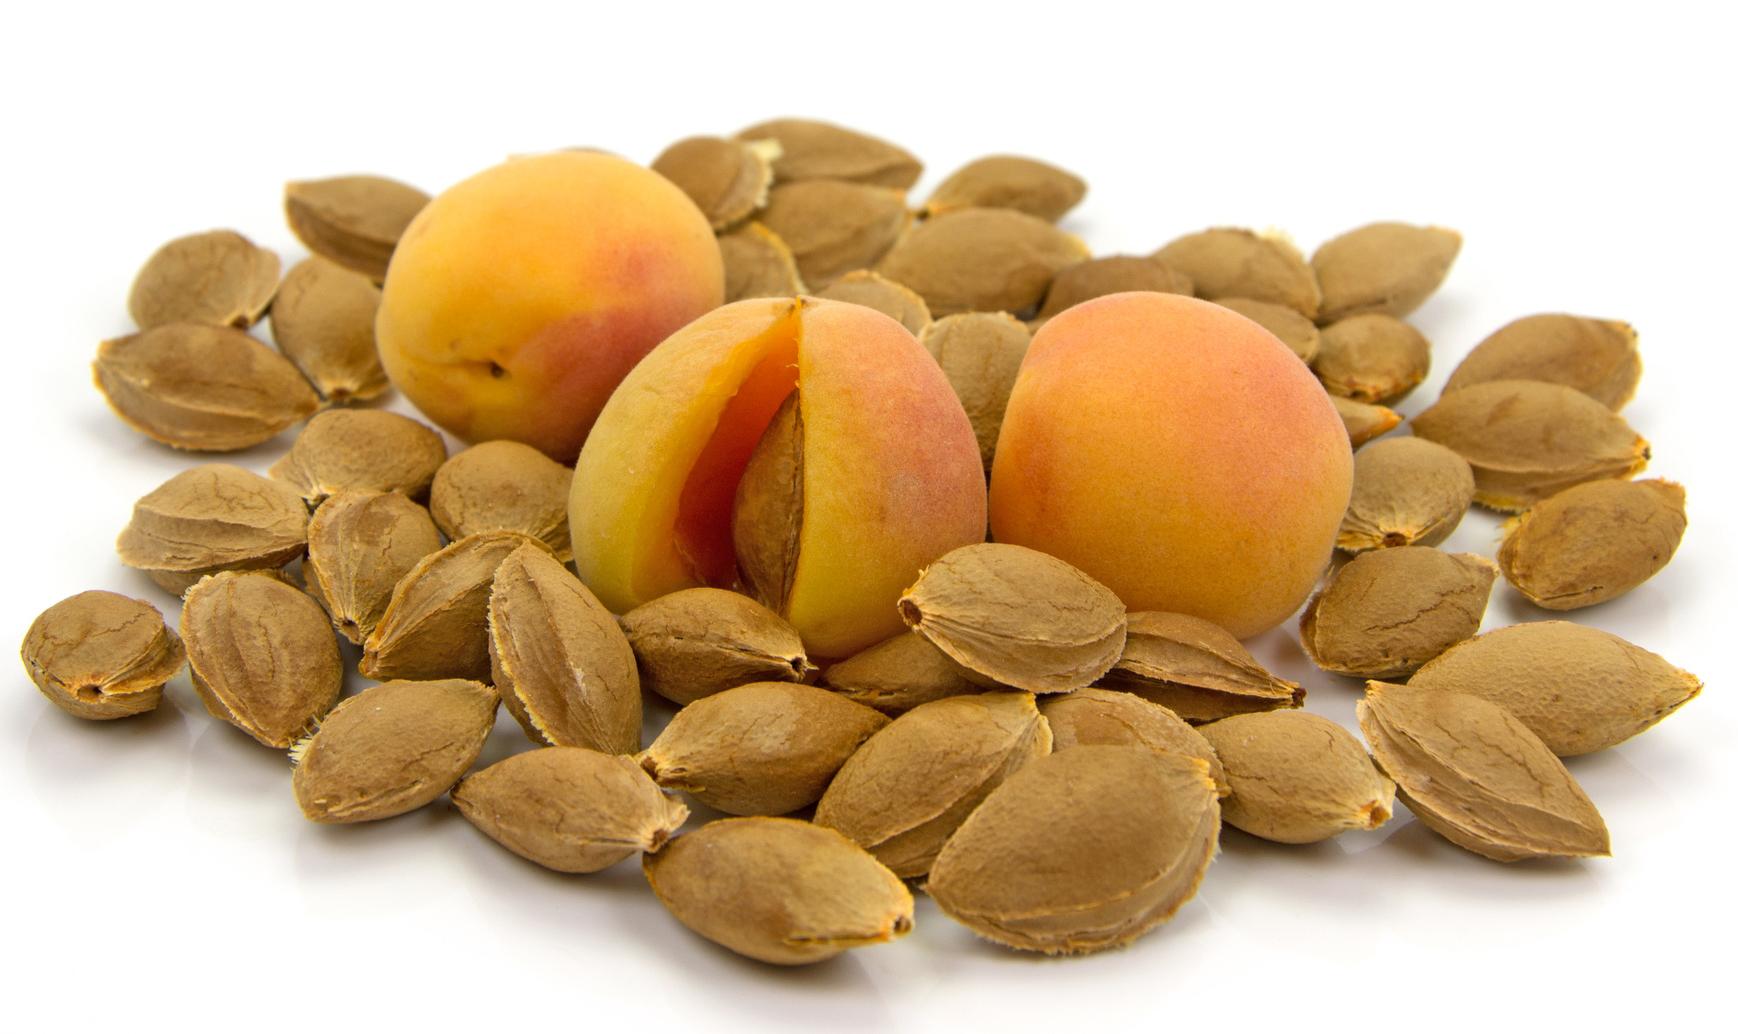 HILDEGARD BRAUKMANN Aprikosenkernöl